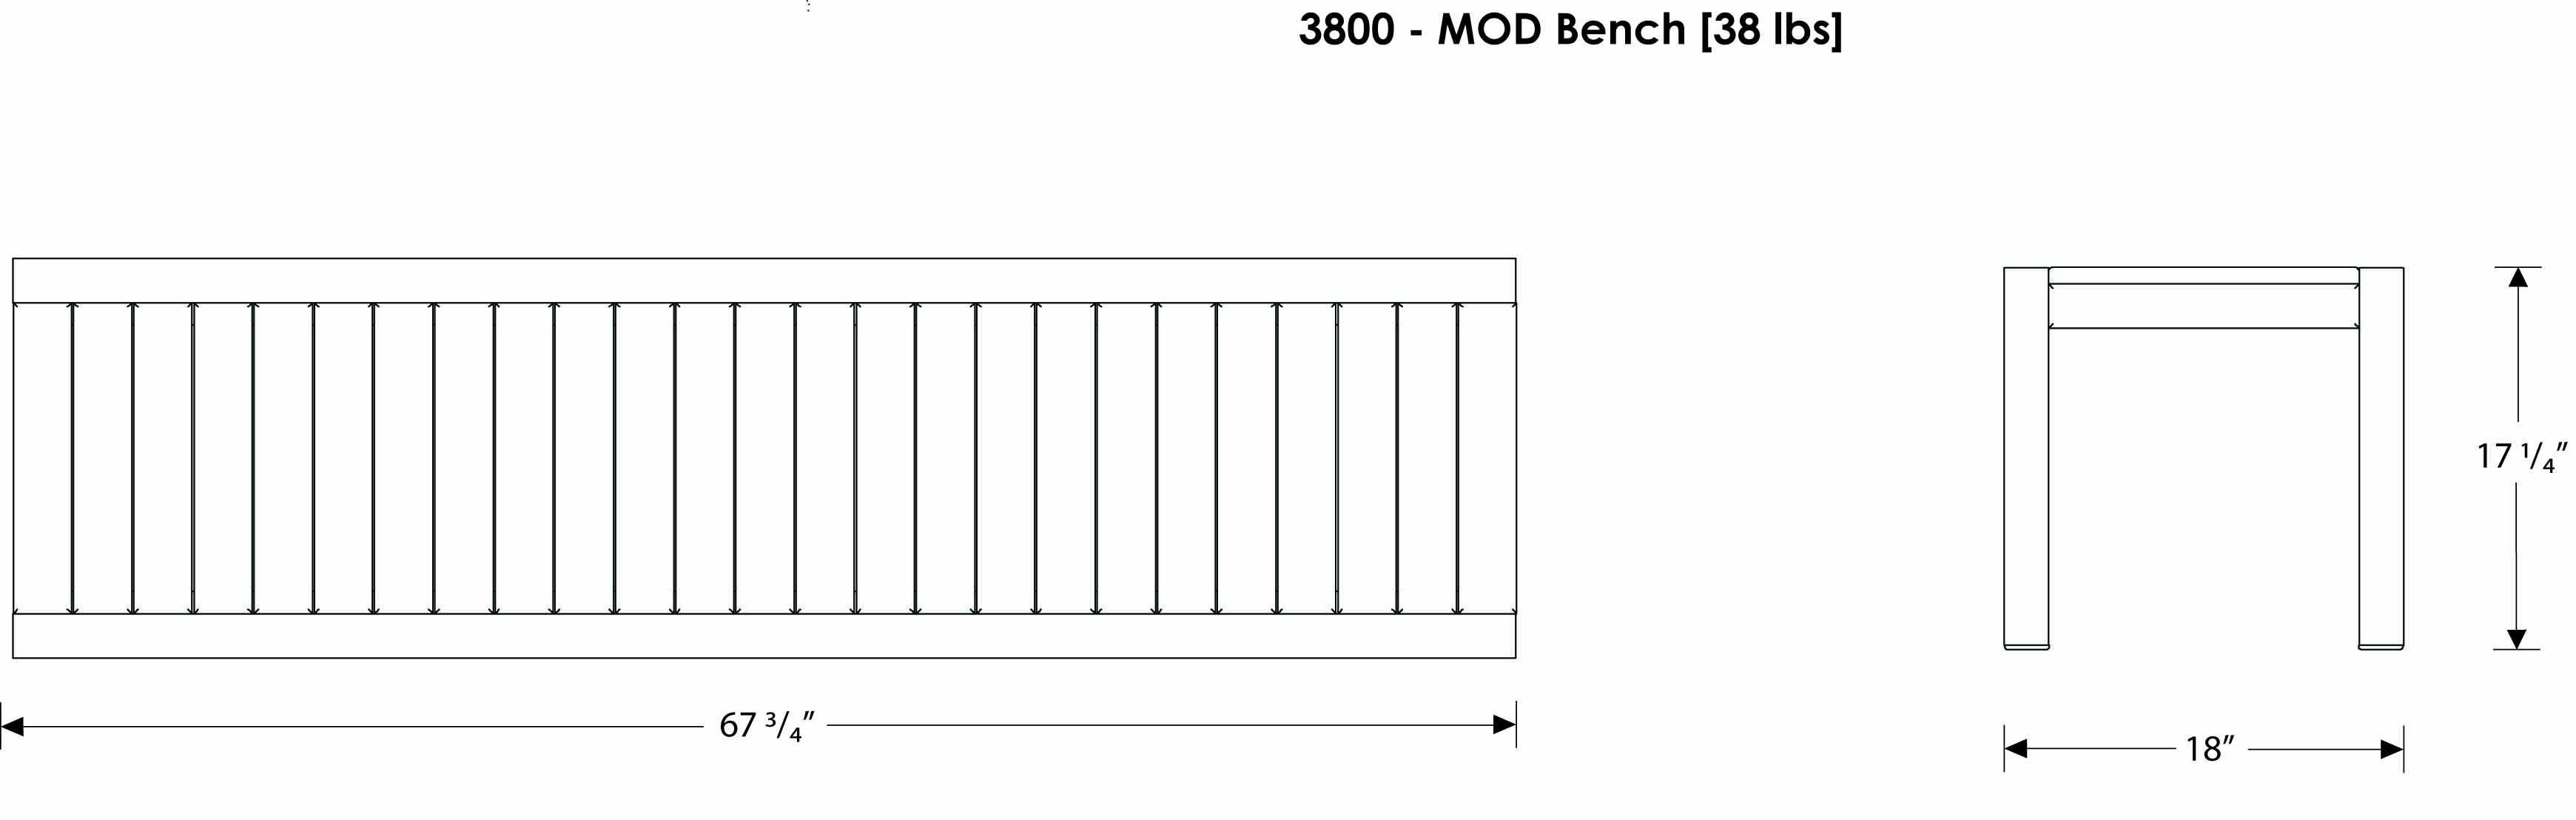 Polywood 174 Mod Bench